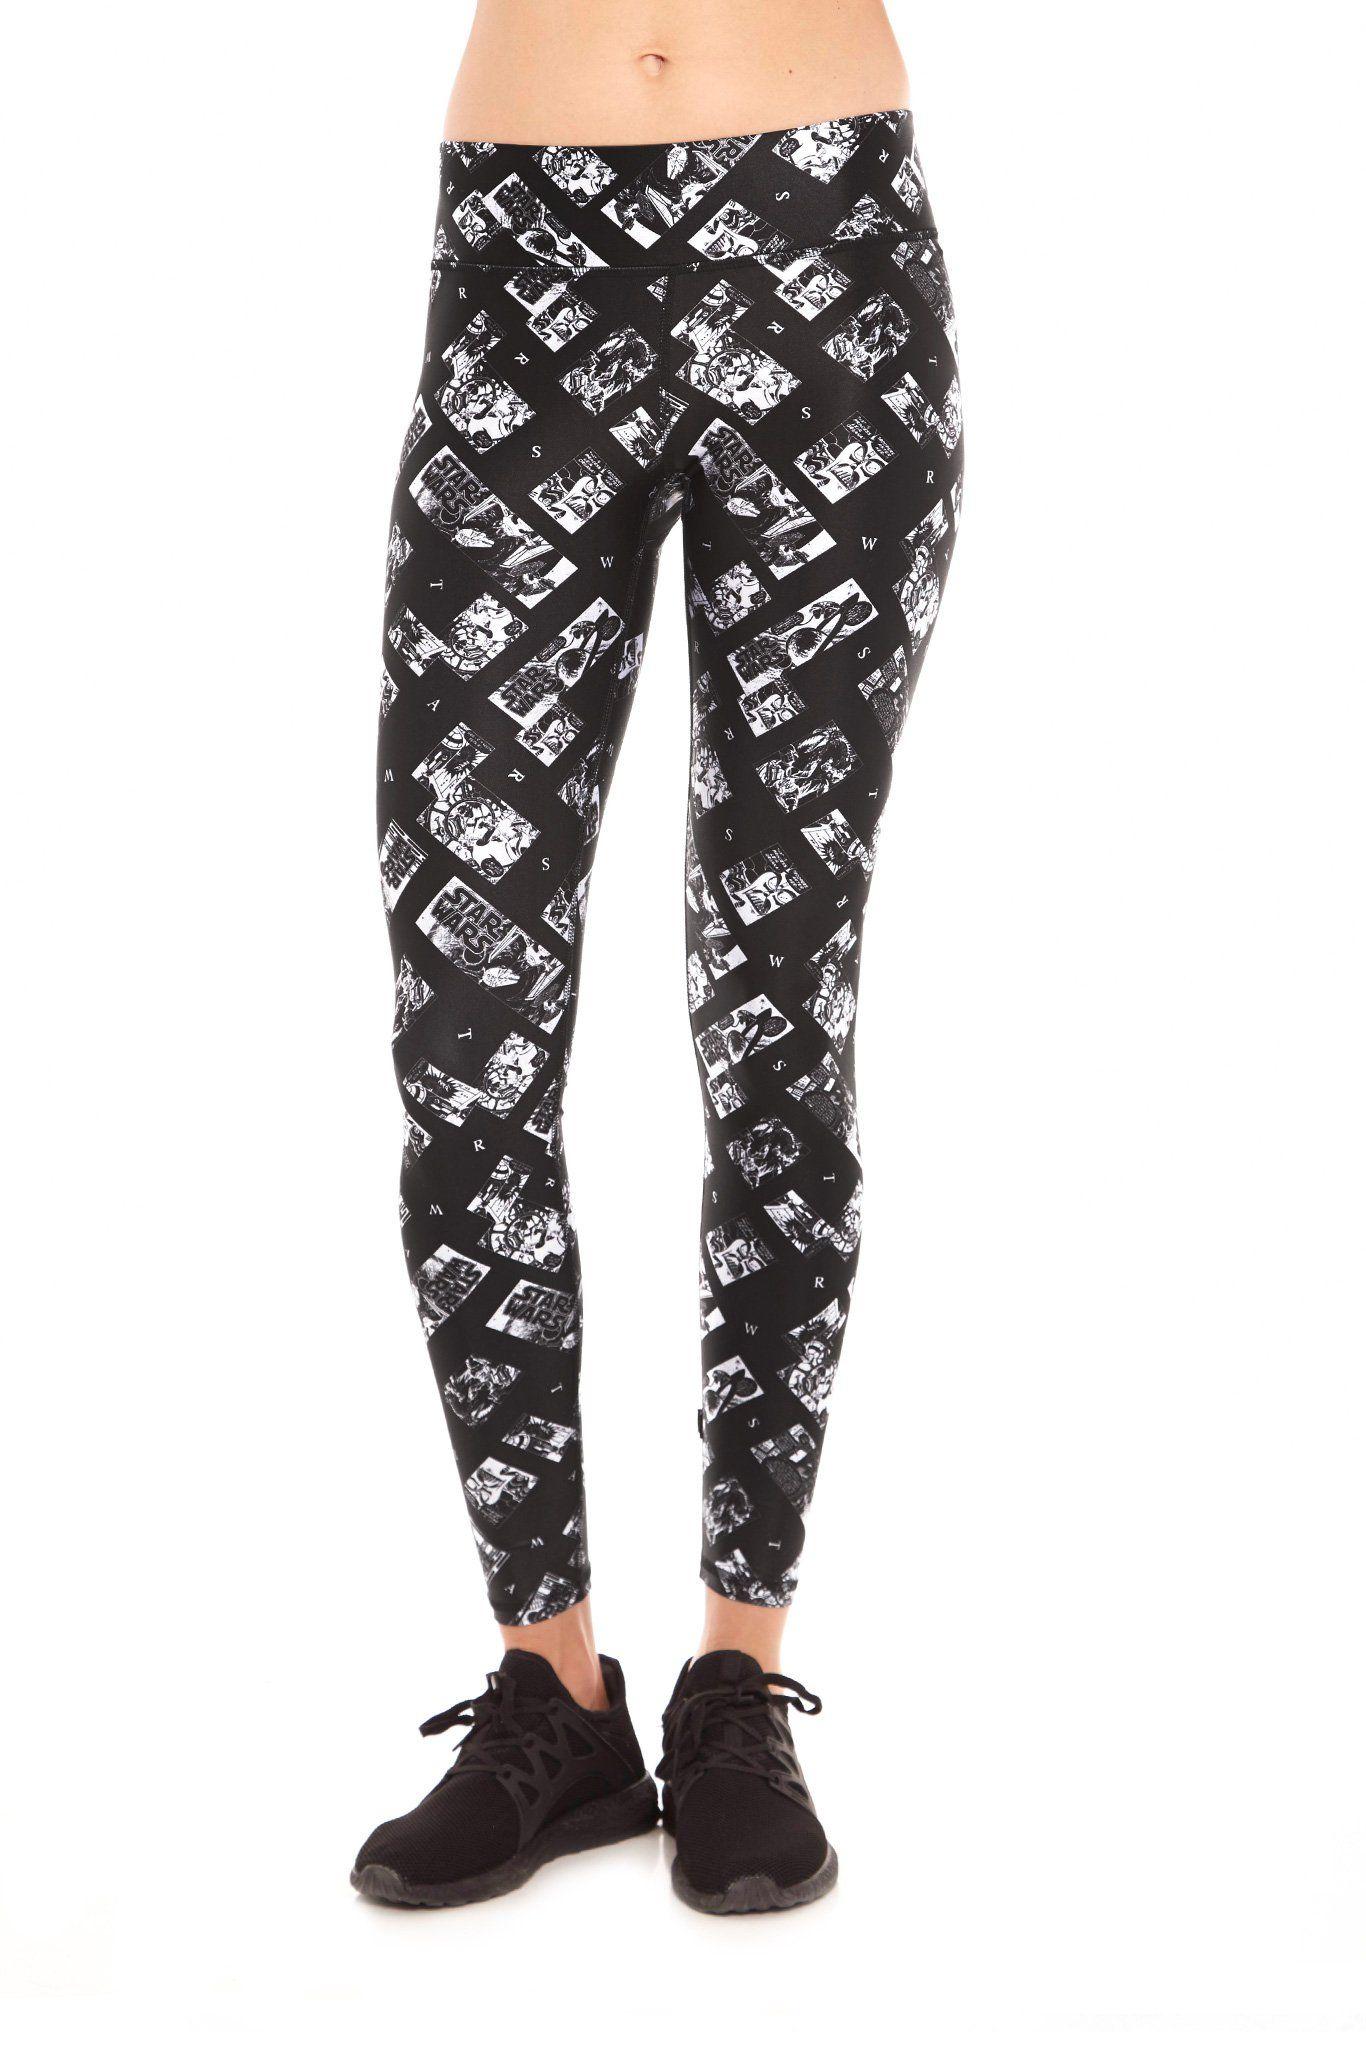 5fc456d36bf0d Women's Terez x Star Wars Comic Strip Leggings ⭐️The Kessel Runway ⭐ Star  Wars fashion ⭐ Geek Fashion ⭐ Star Wars Style ⭐ Geek Chic ⭐️